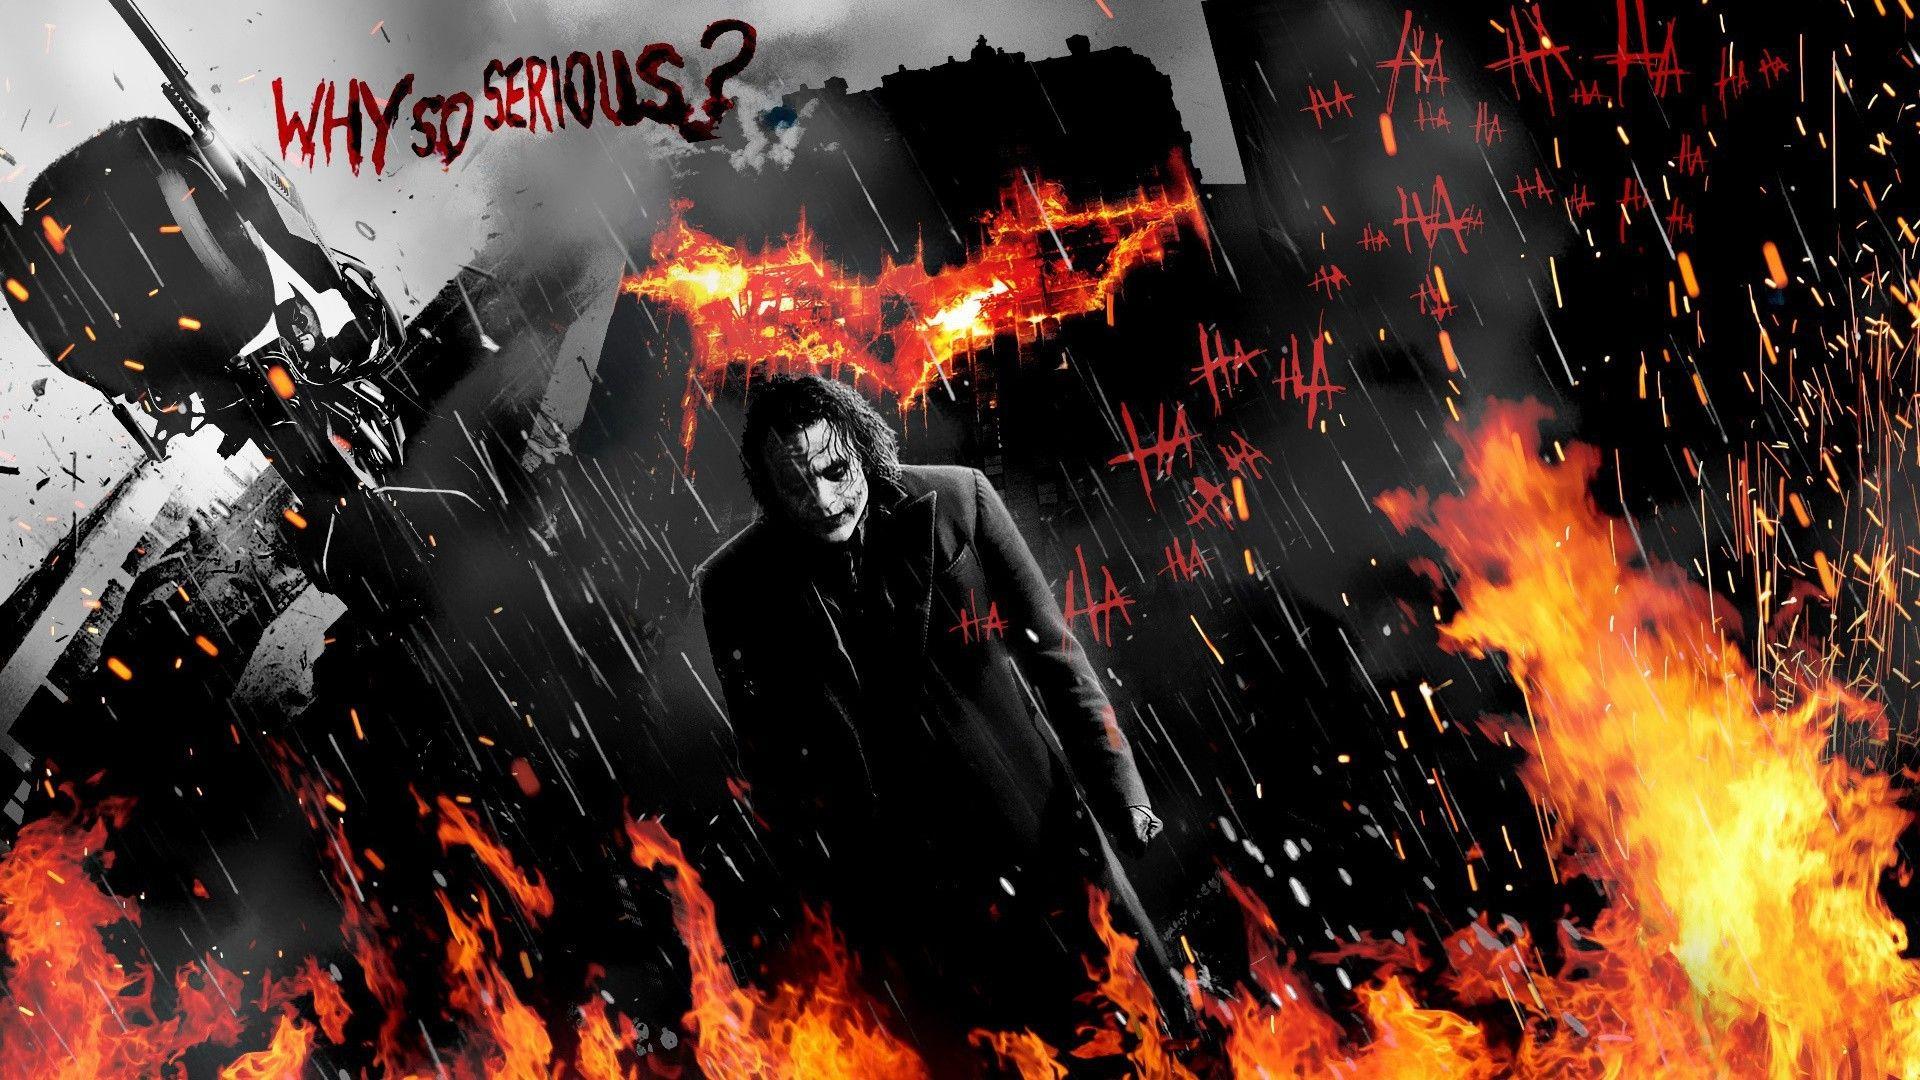 Joker Batman Dark Knight Why So Serious Wallpaper Joker Wallpapers Batman Joker Wallpaper Batman Joker